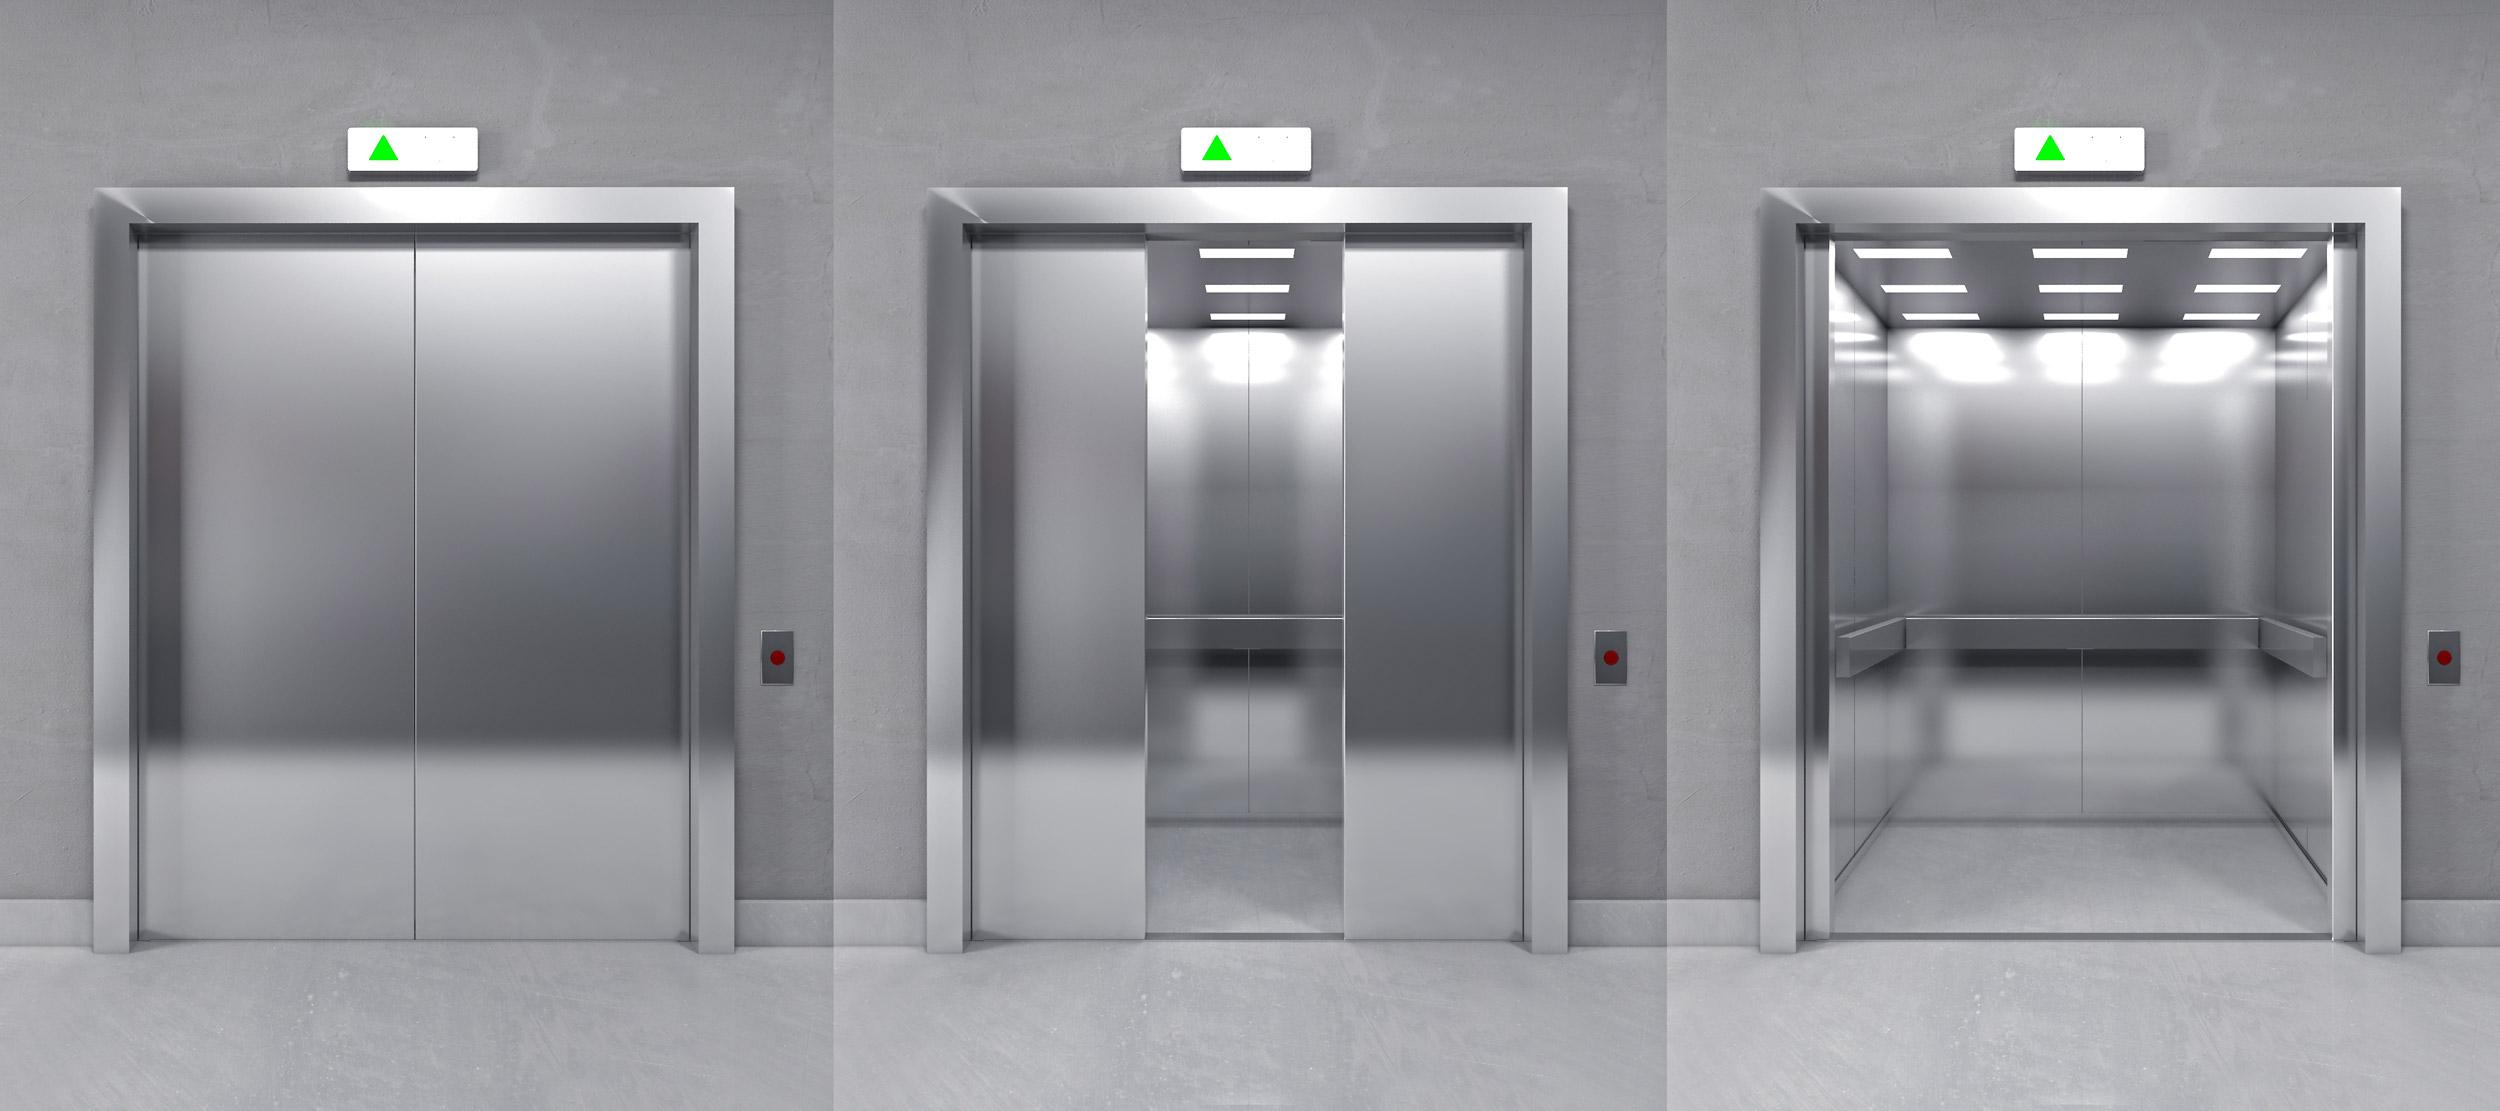 Redl Bau Aufzugszubau